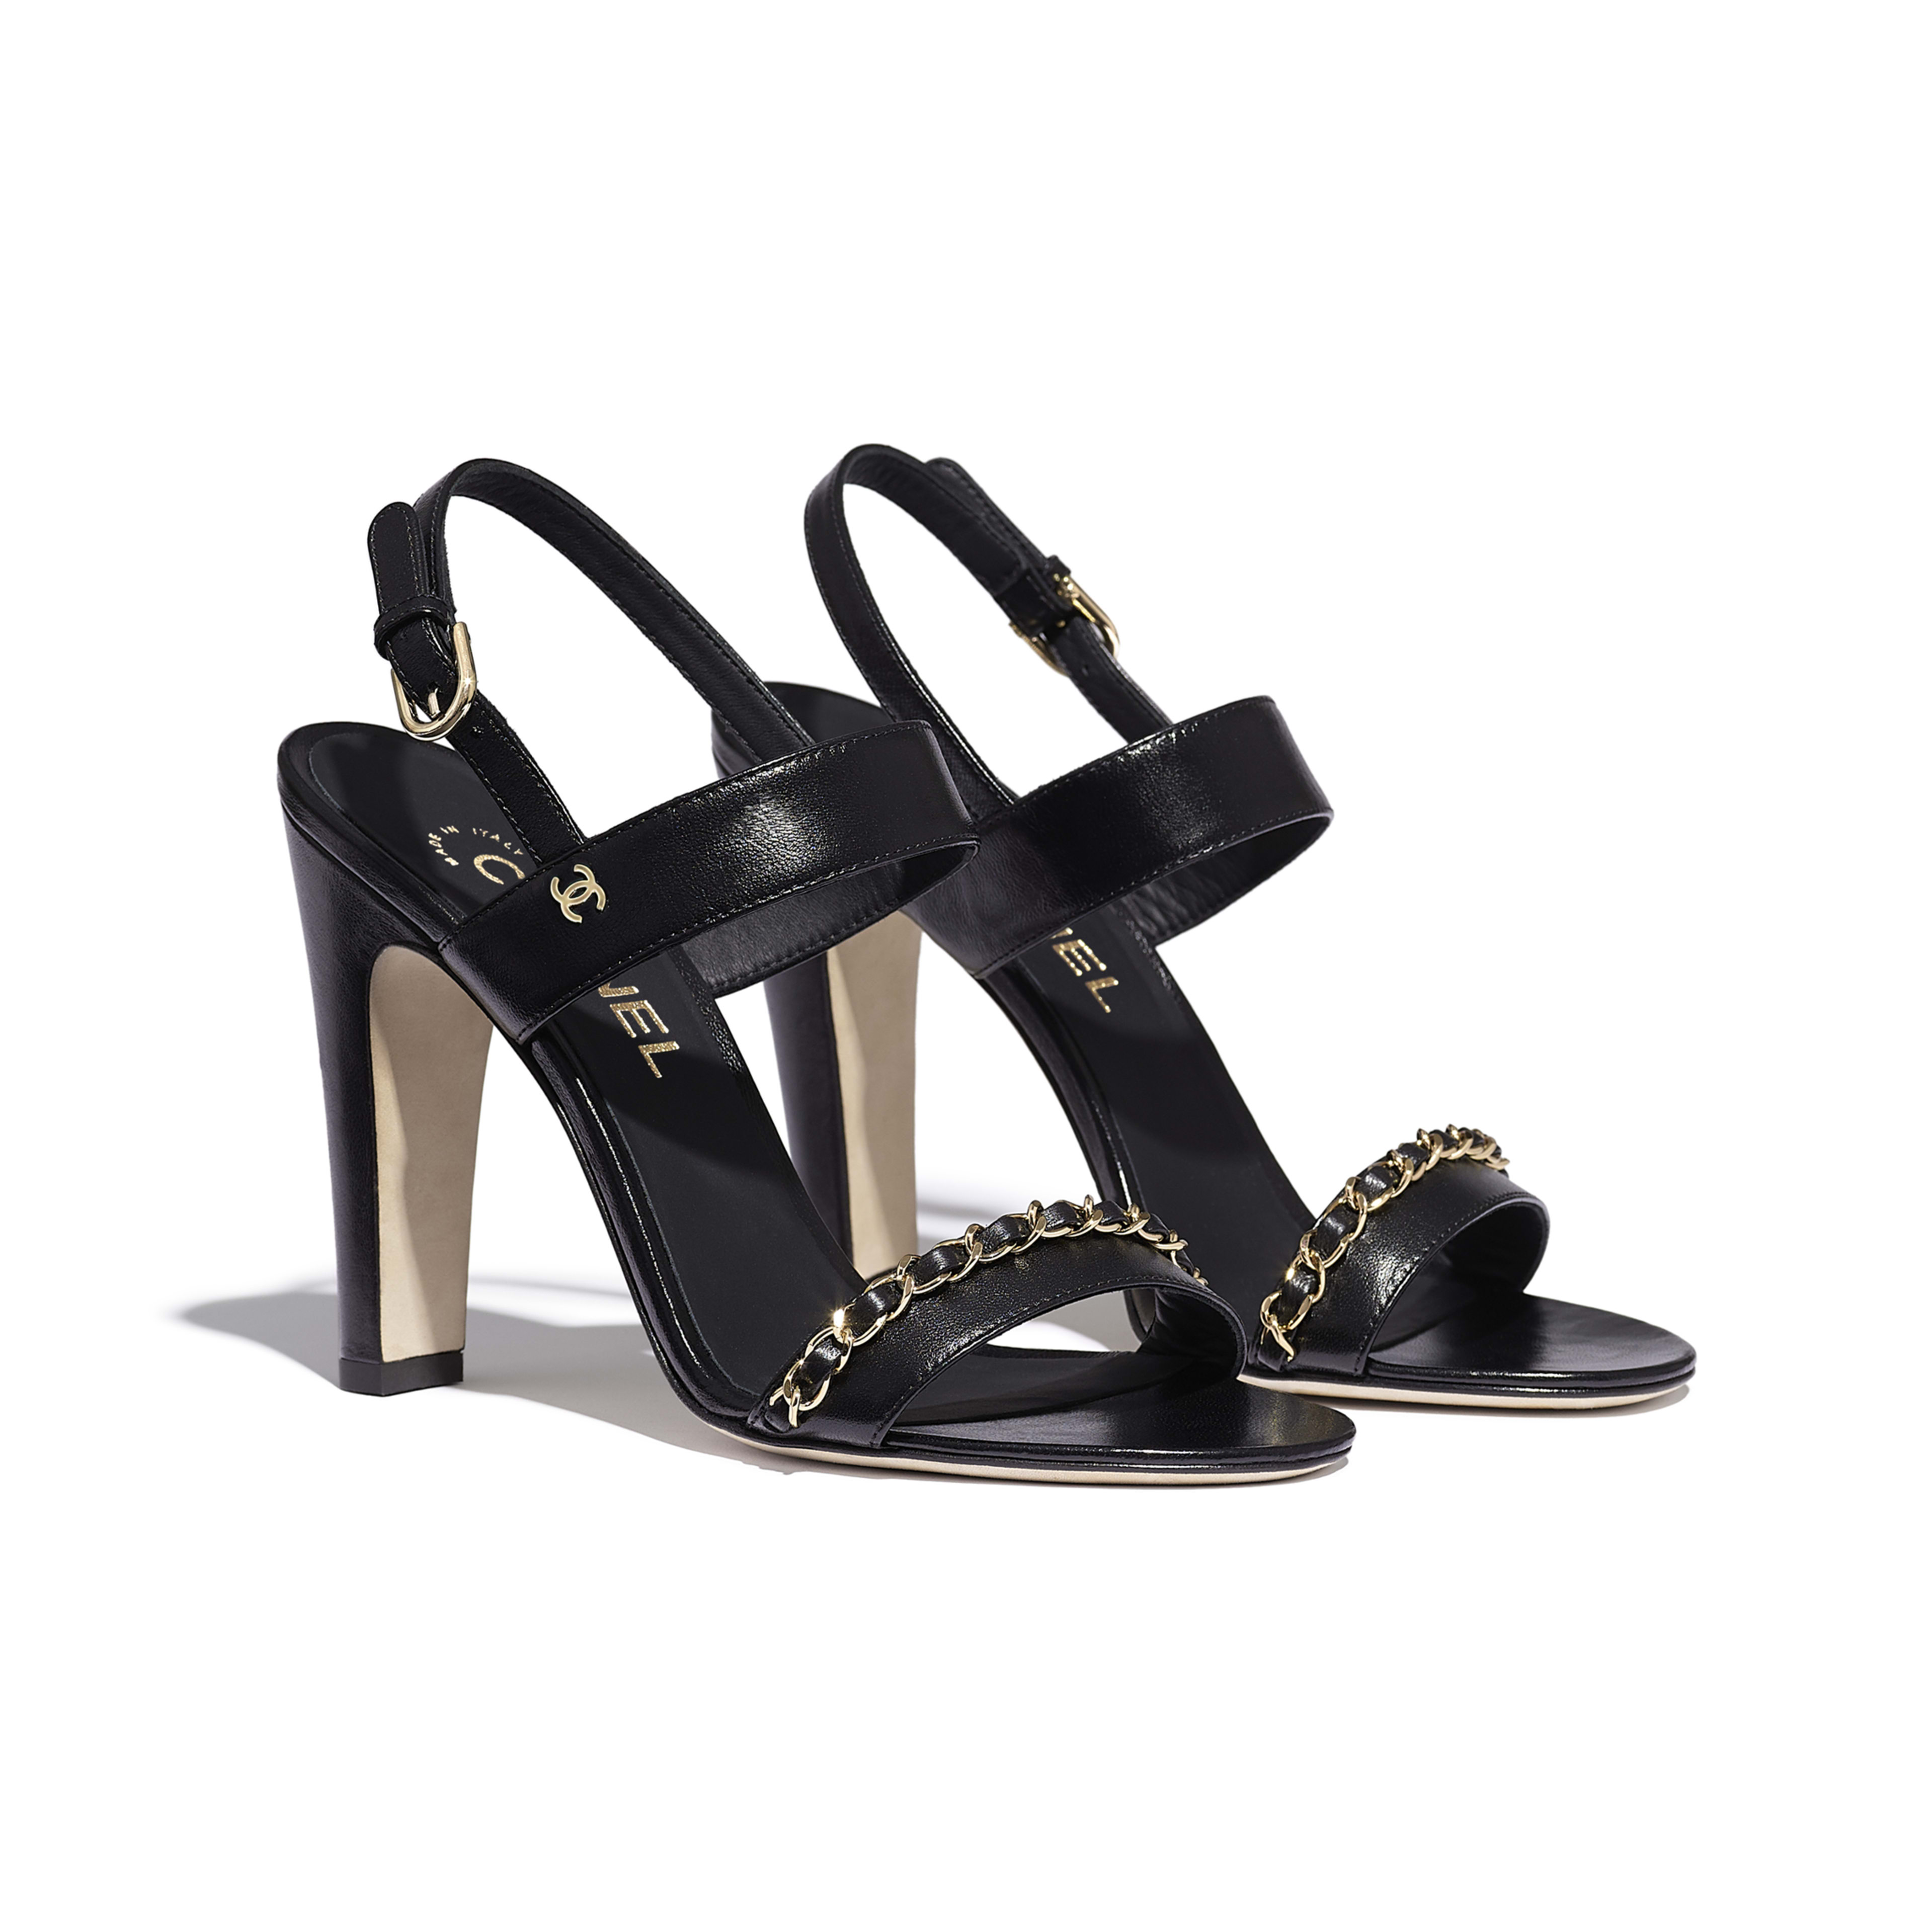 Sandals - Black - Lambskin - Alternative view - see full sized version